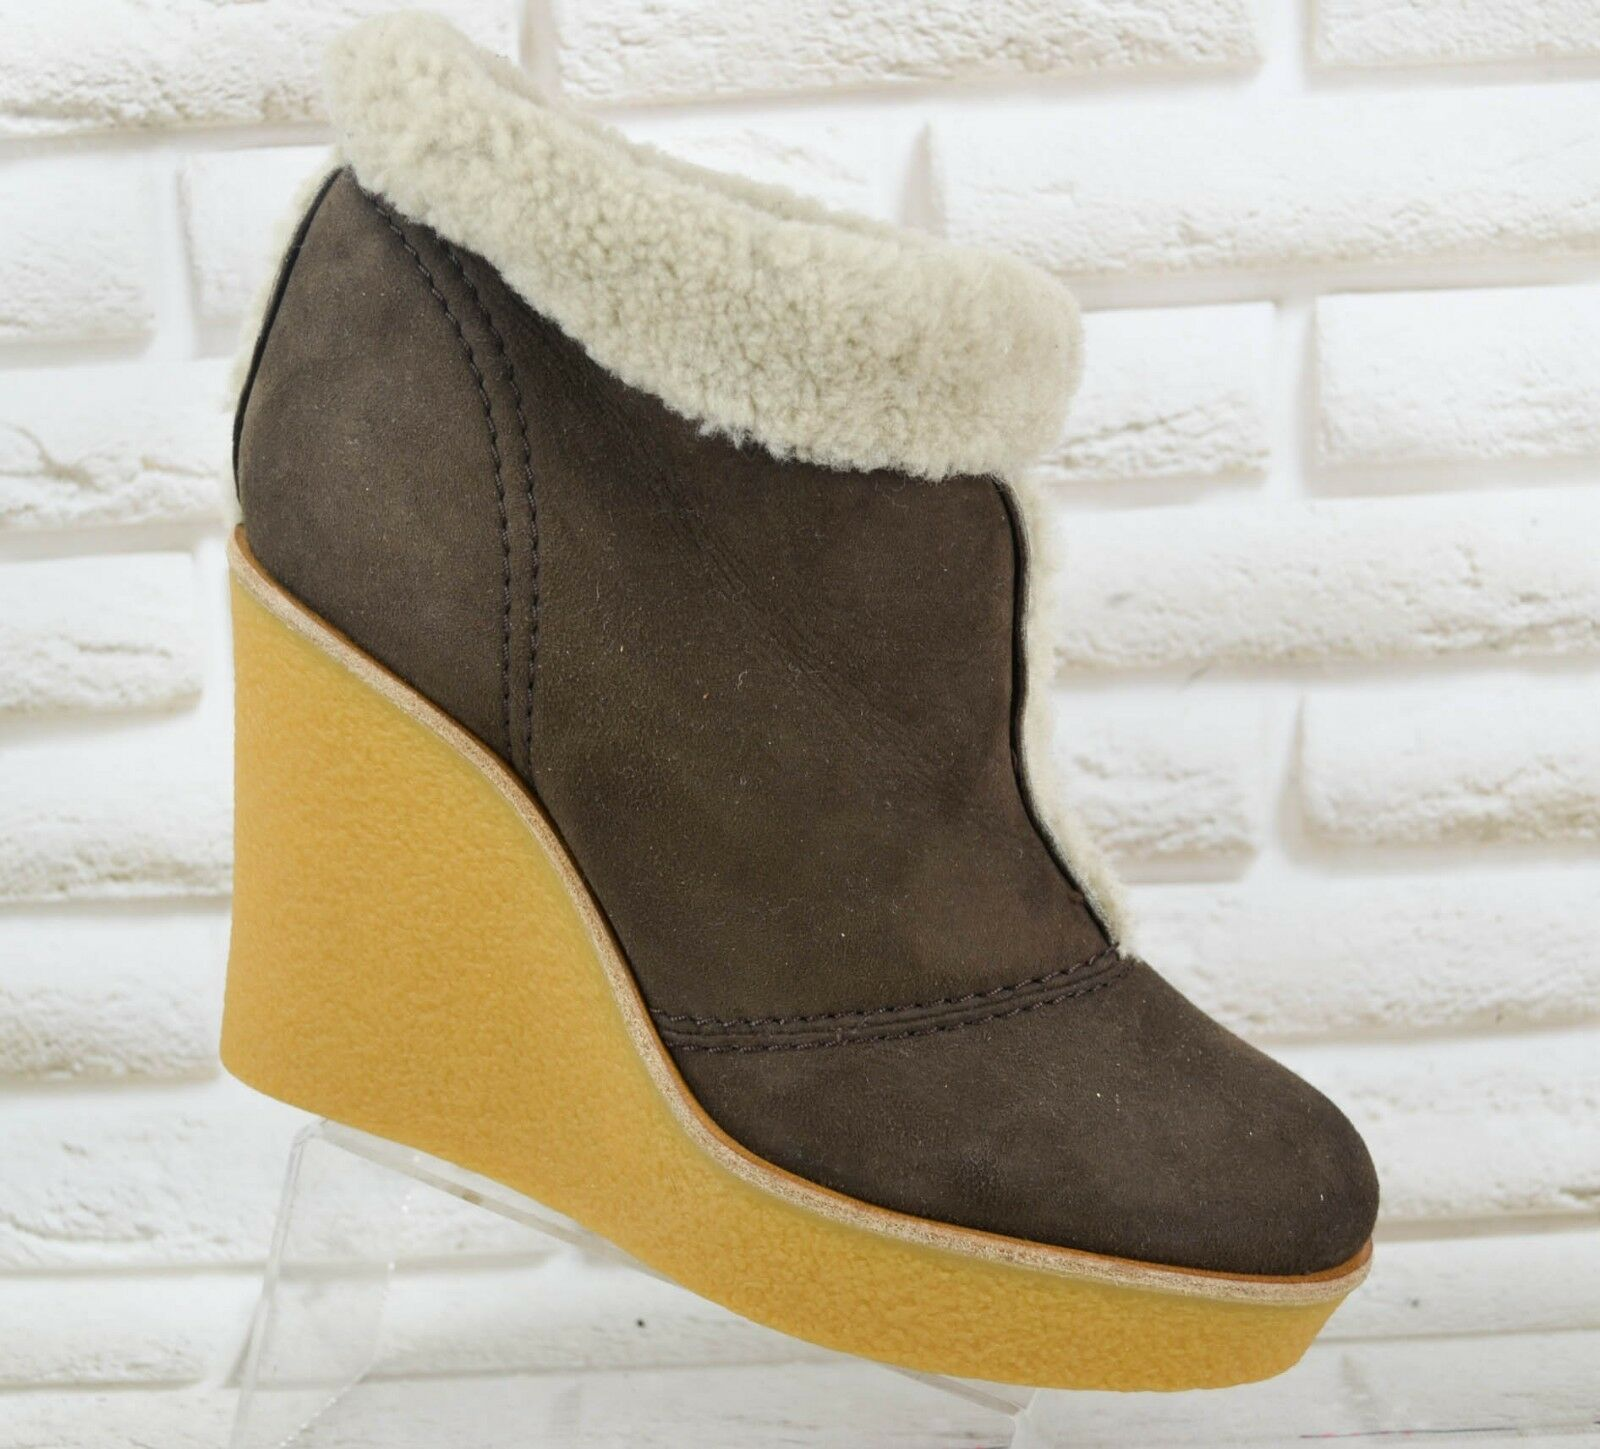 CHLOE braun Suede and Shearling Shearling Shearling damen Wedge Ankle Stiefel  Größe 7 UK 40 EU 370632